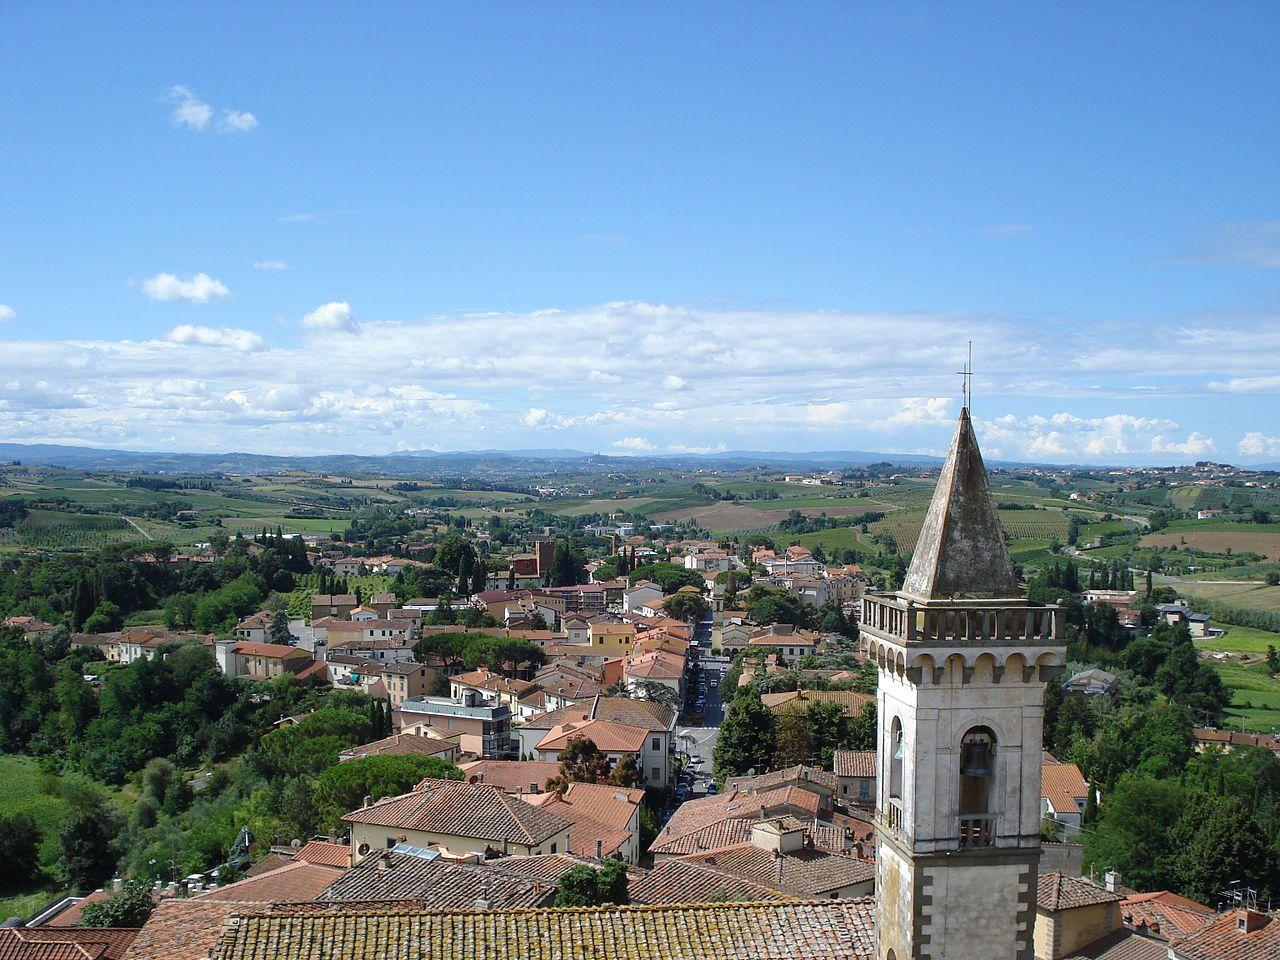 Vinci, Italy: Home Town of Leonardo da Vinci in Tuscany